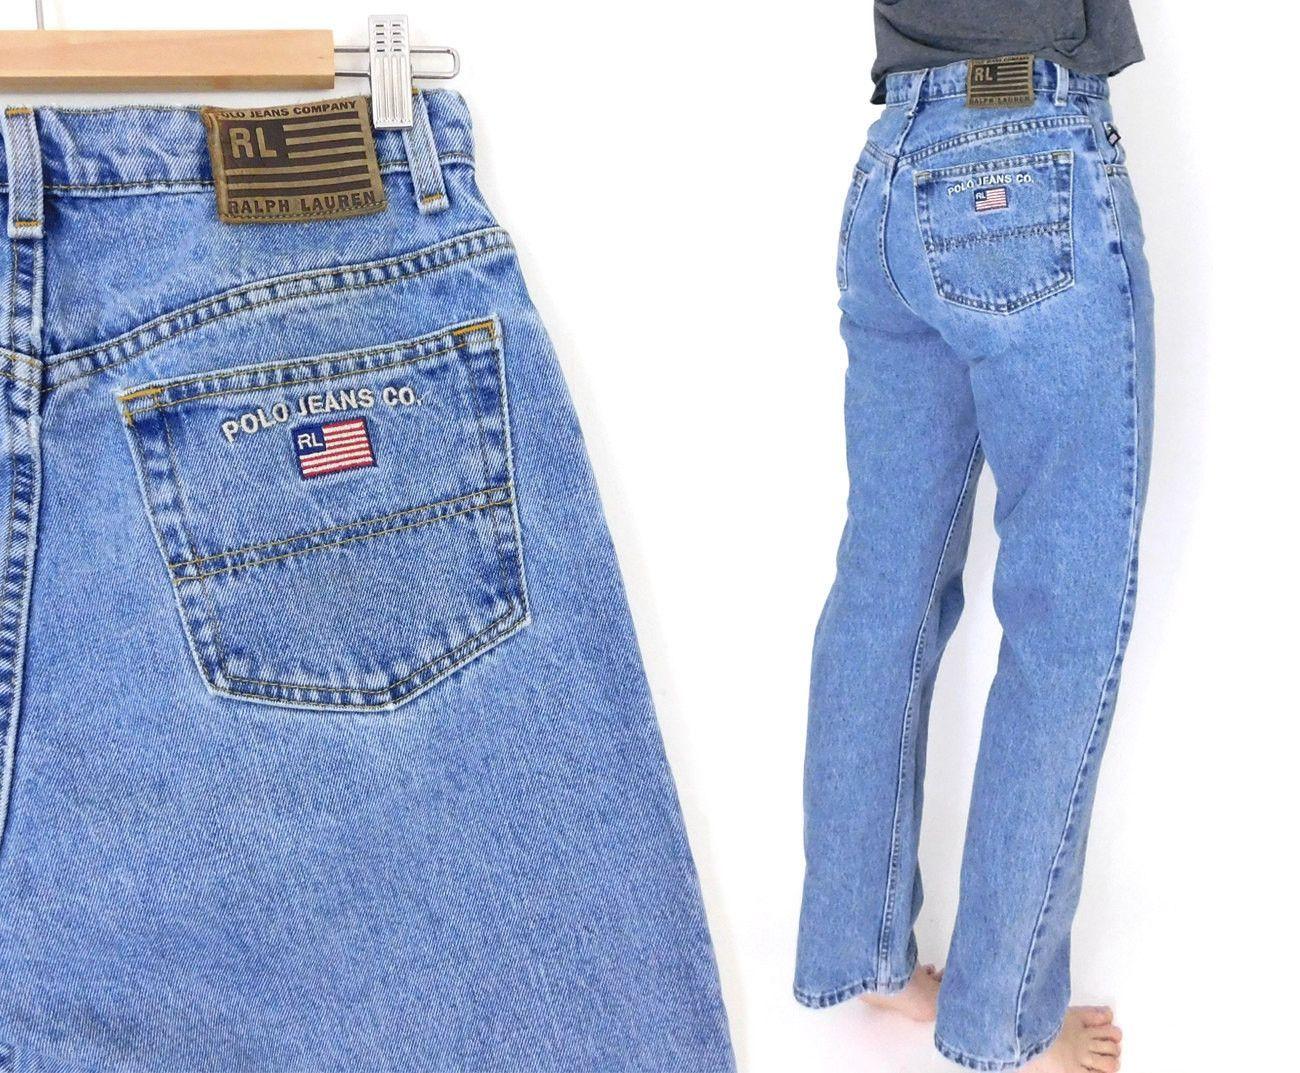 4bc9fafeed91 Sz 10 90s Women s High Waisted Polo Jeans - Women s Vintage Ralph Lauren  Straight Leg Boyfriend Jeans - 29 Waist